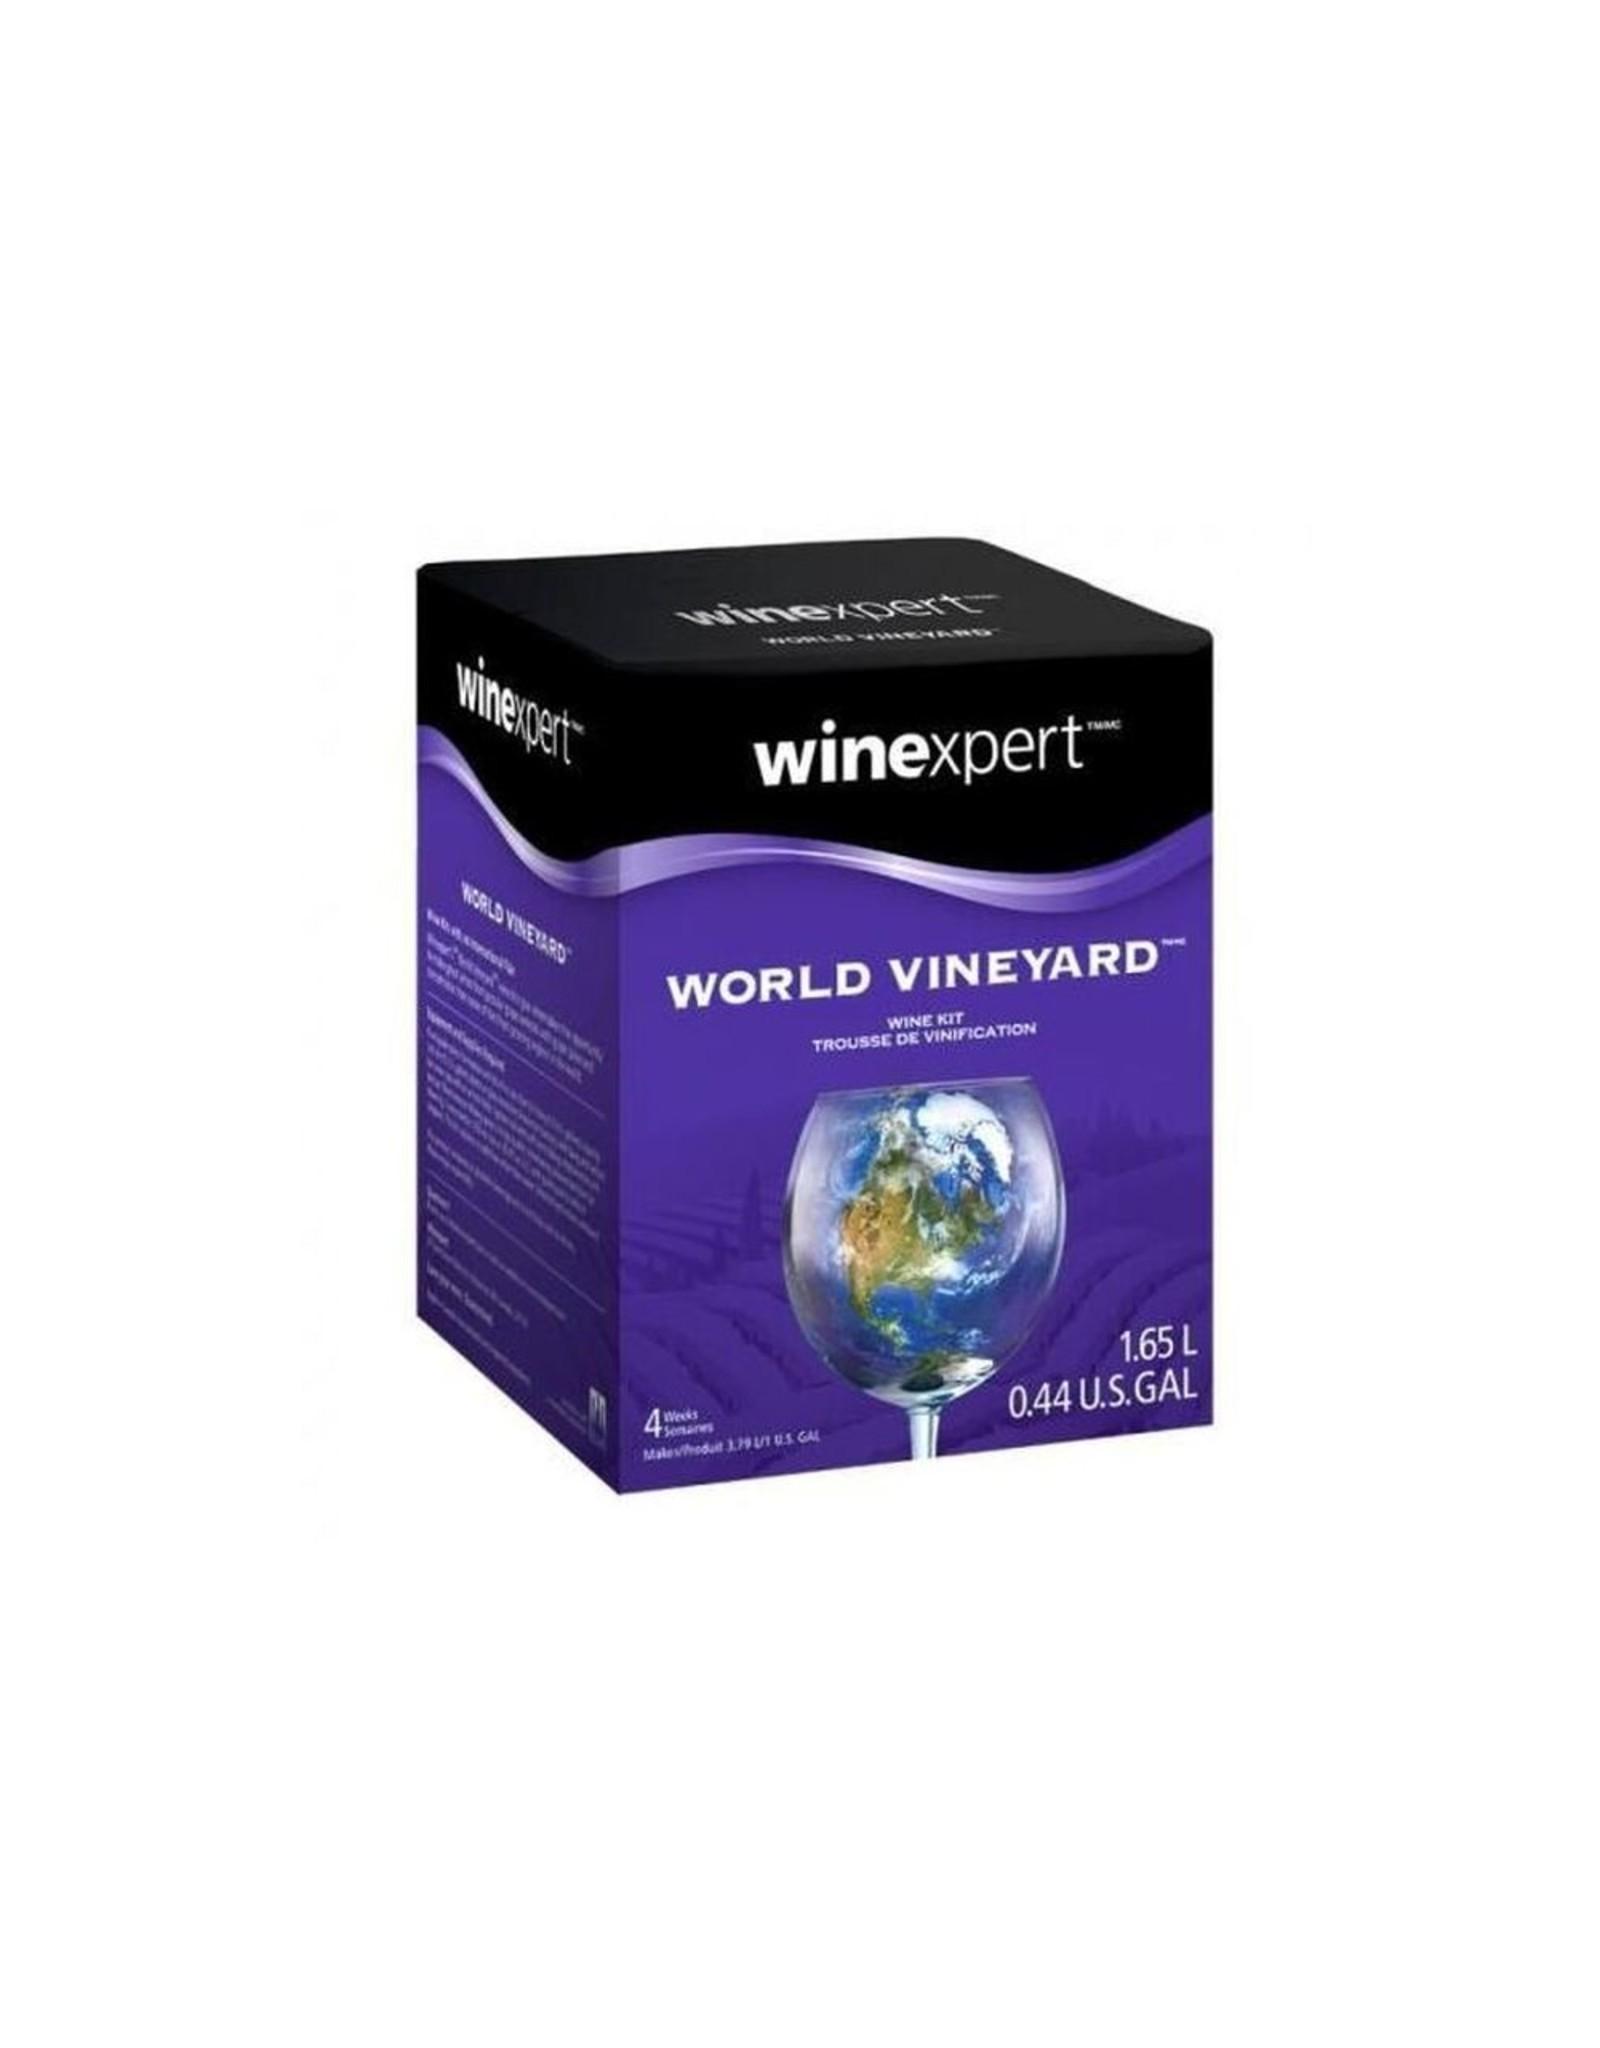 WINE EXPERT CHILEAN MERLOT 10L WINE KIT